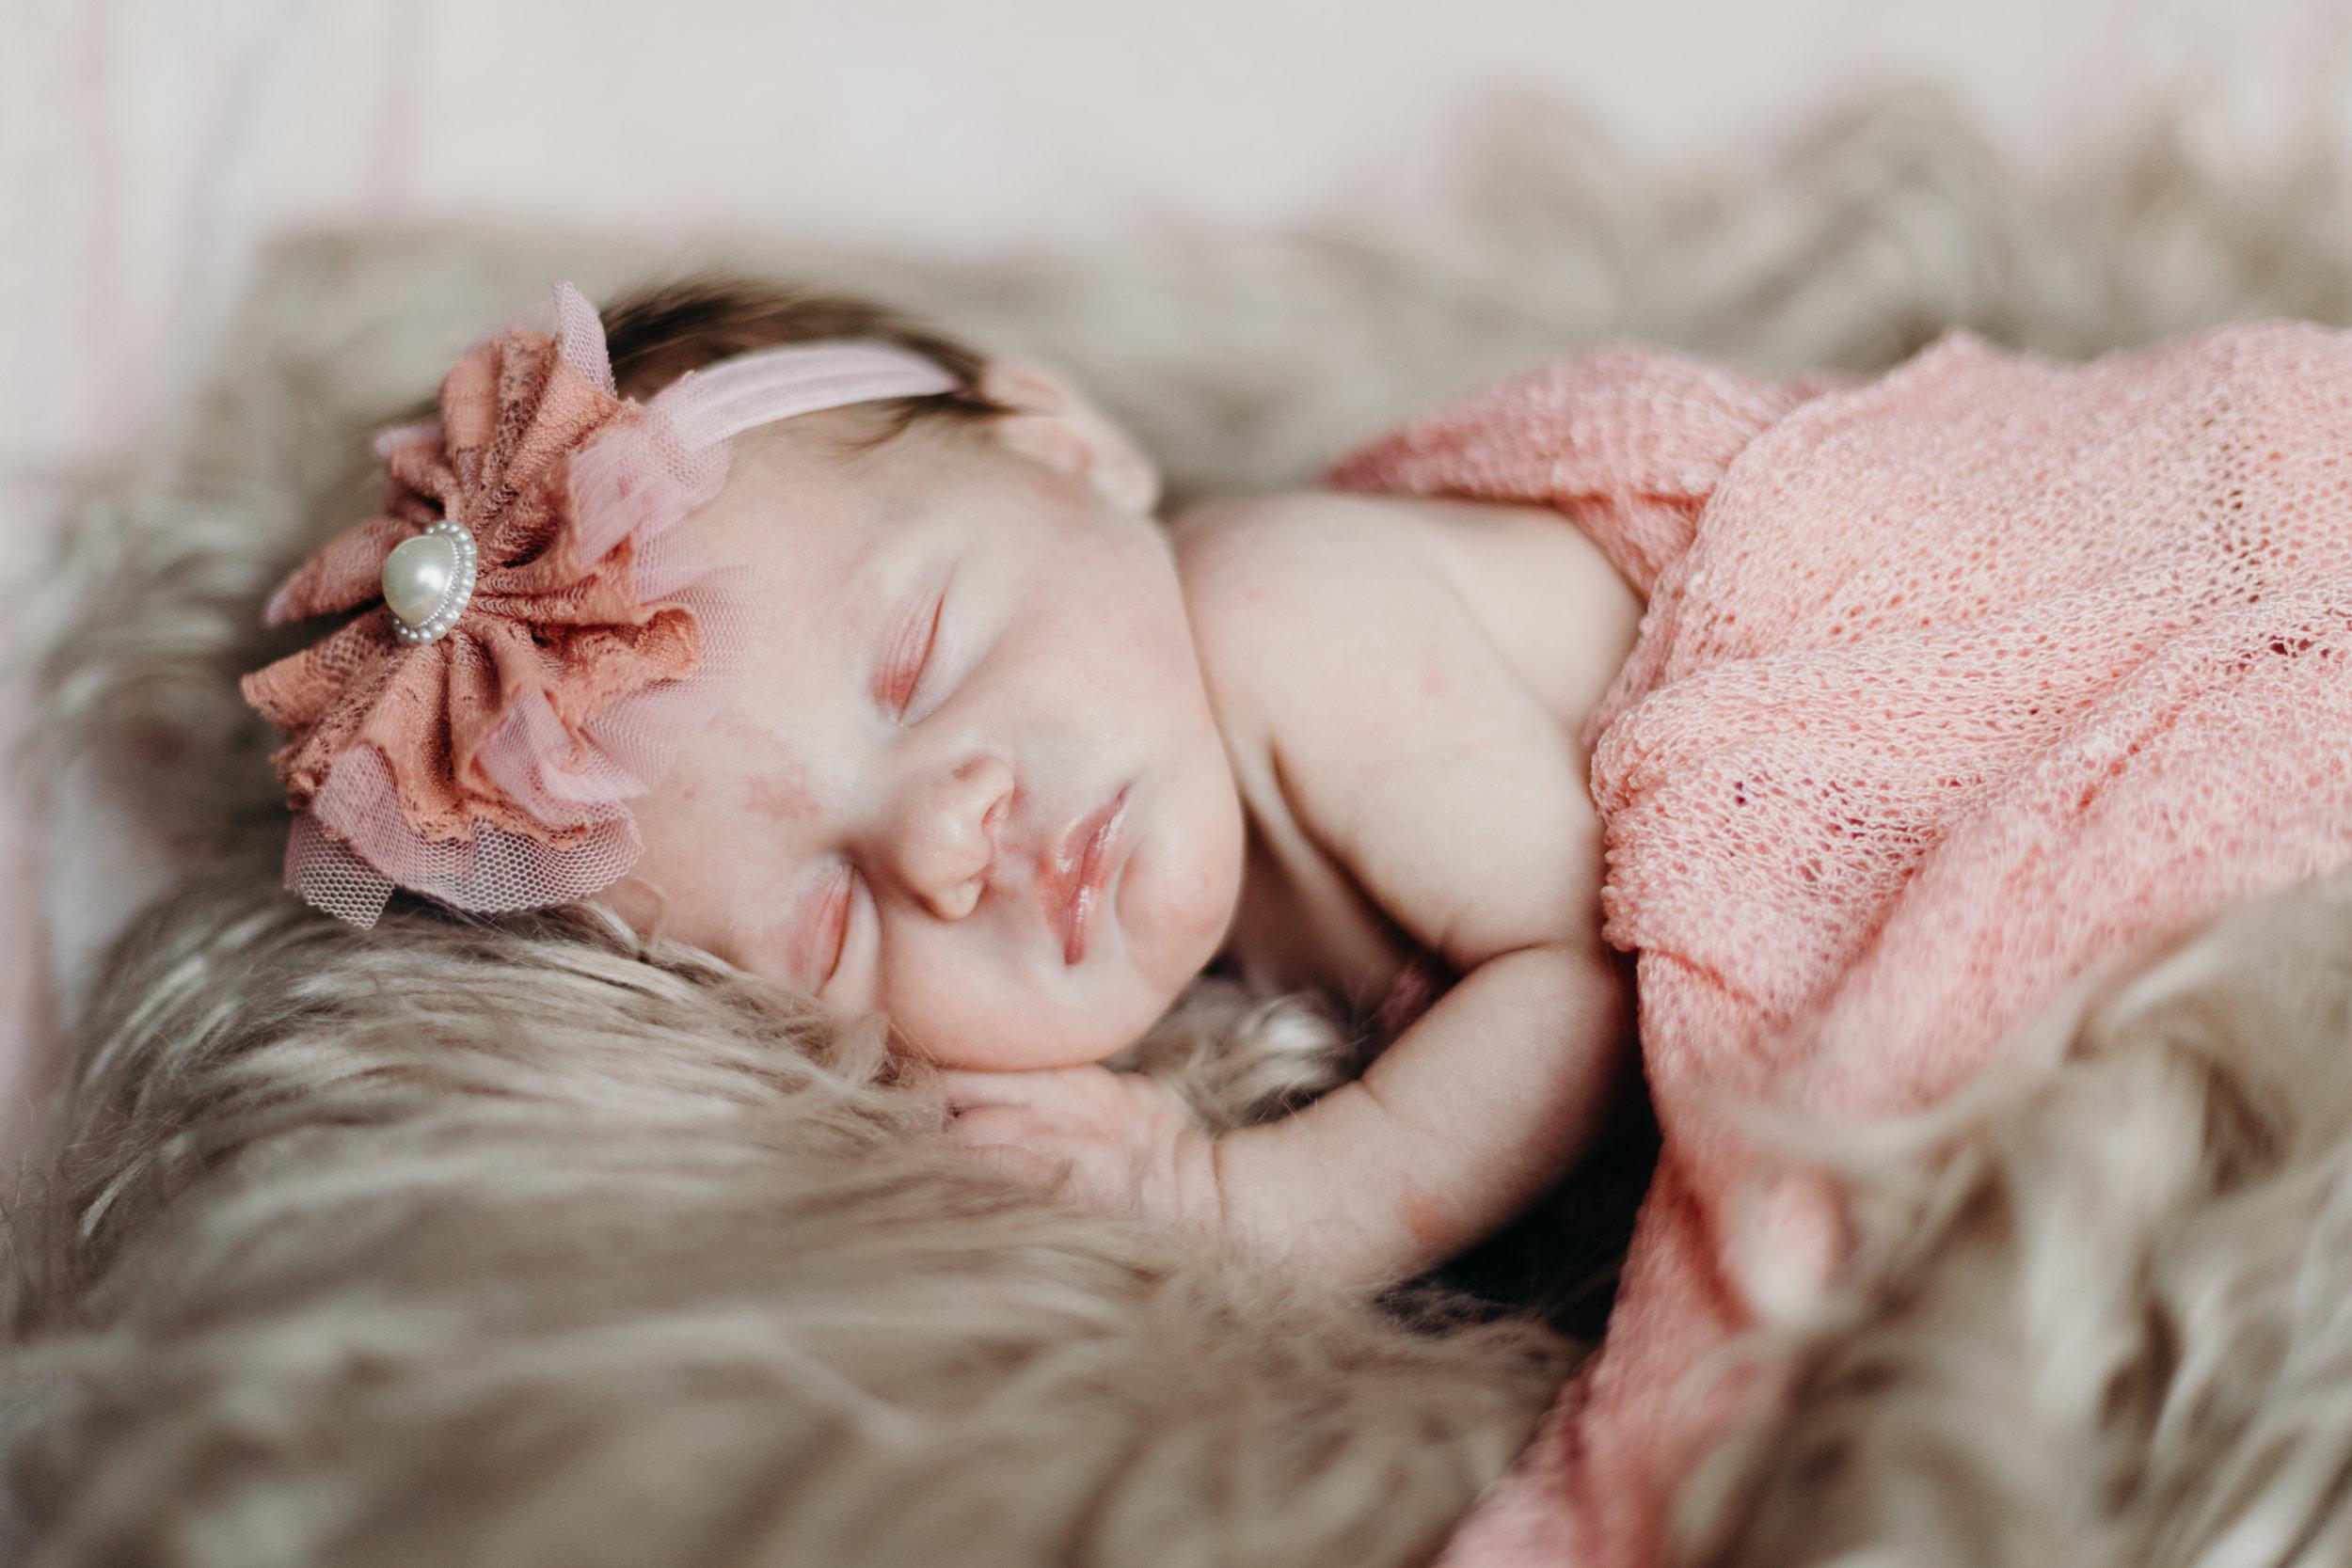 Chicago In Home Newborn Photo by Kerri Carlquist Photography